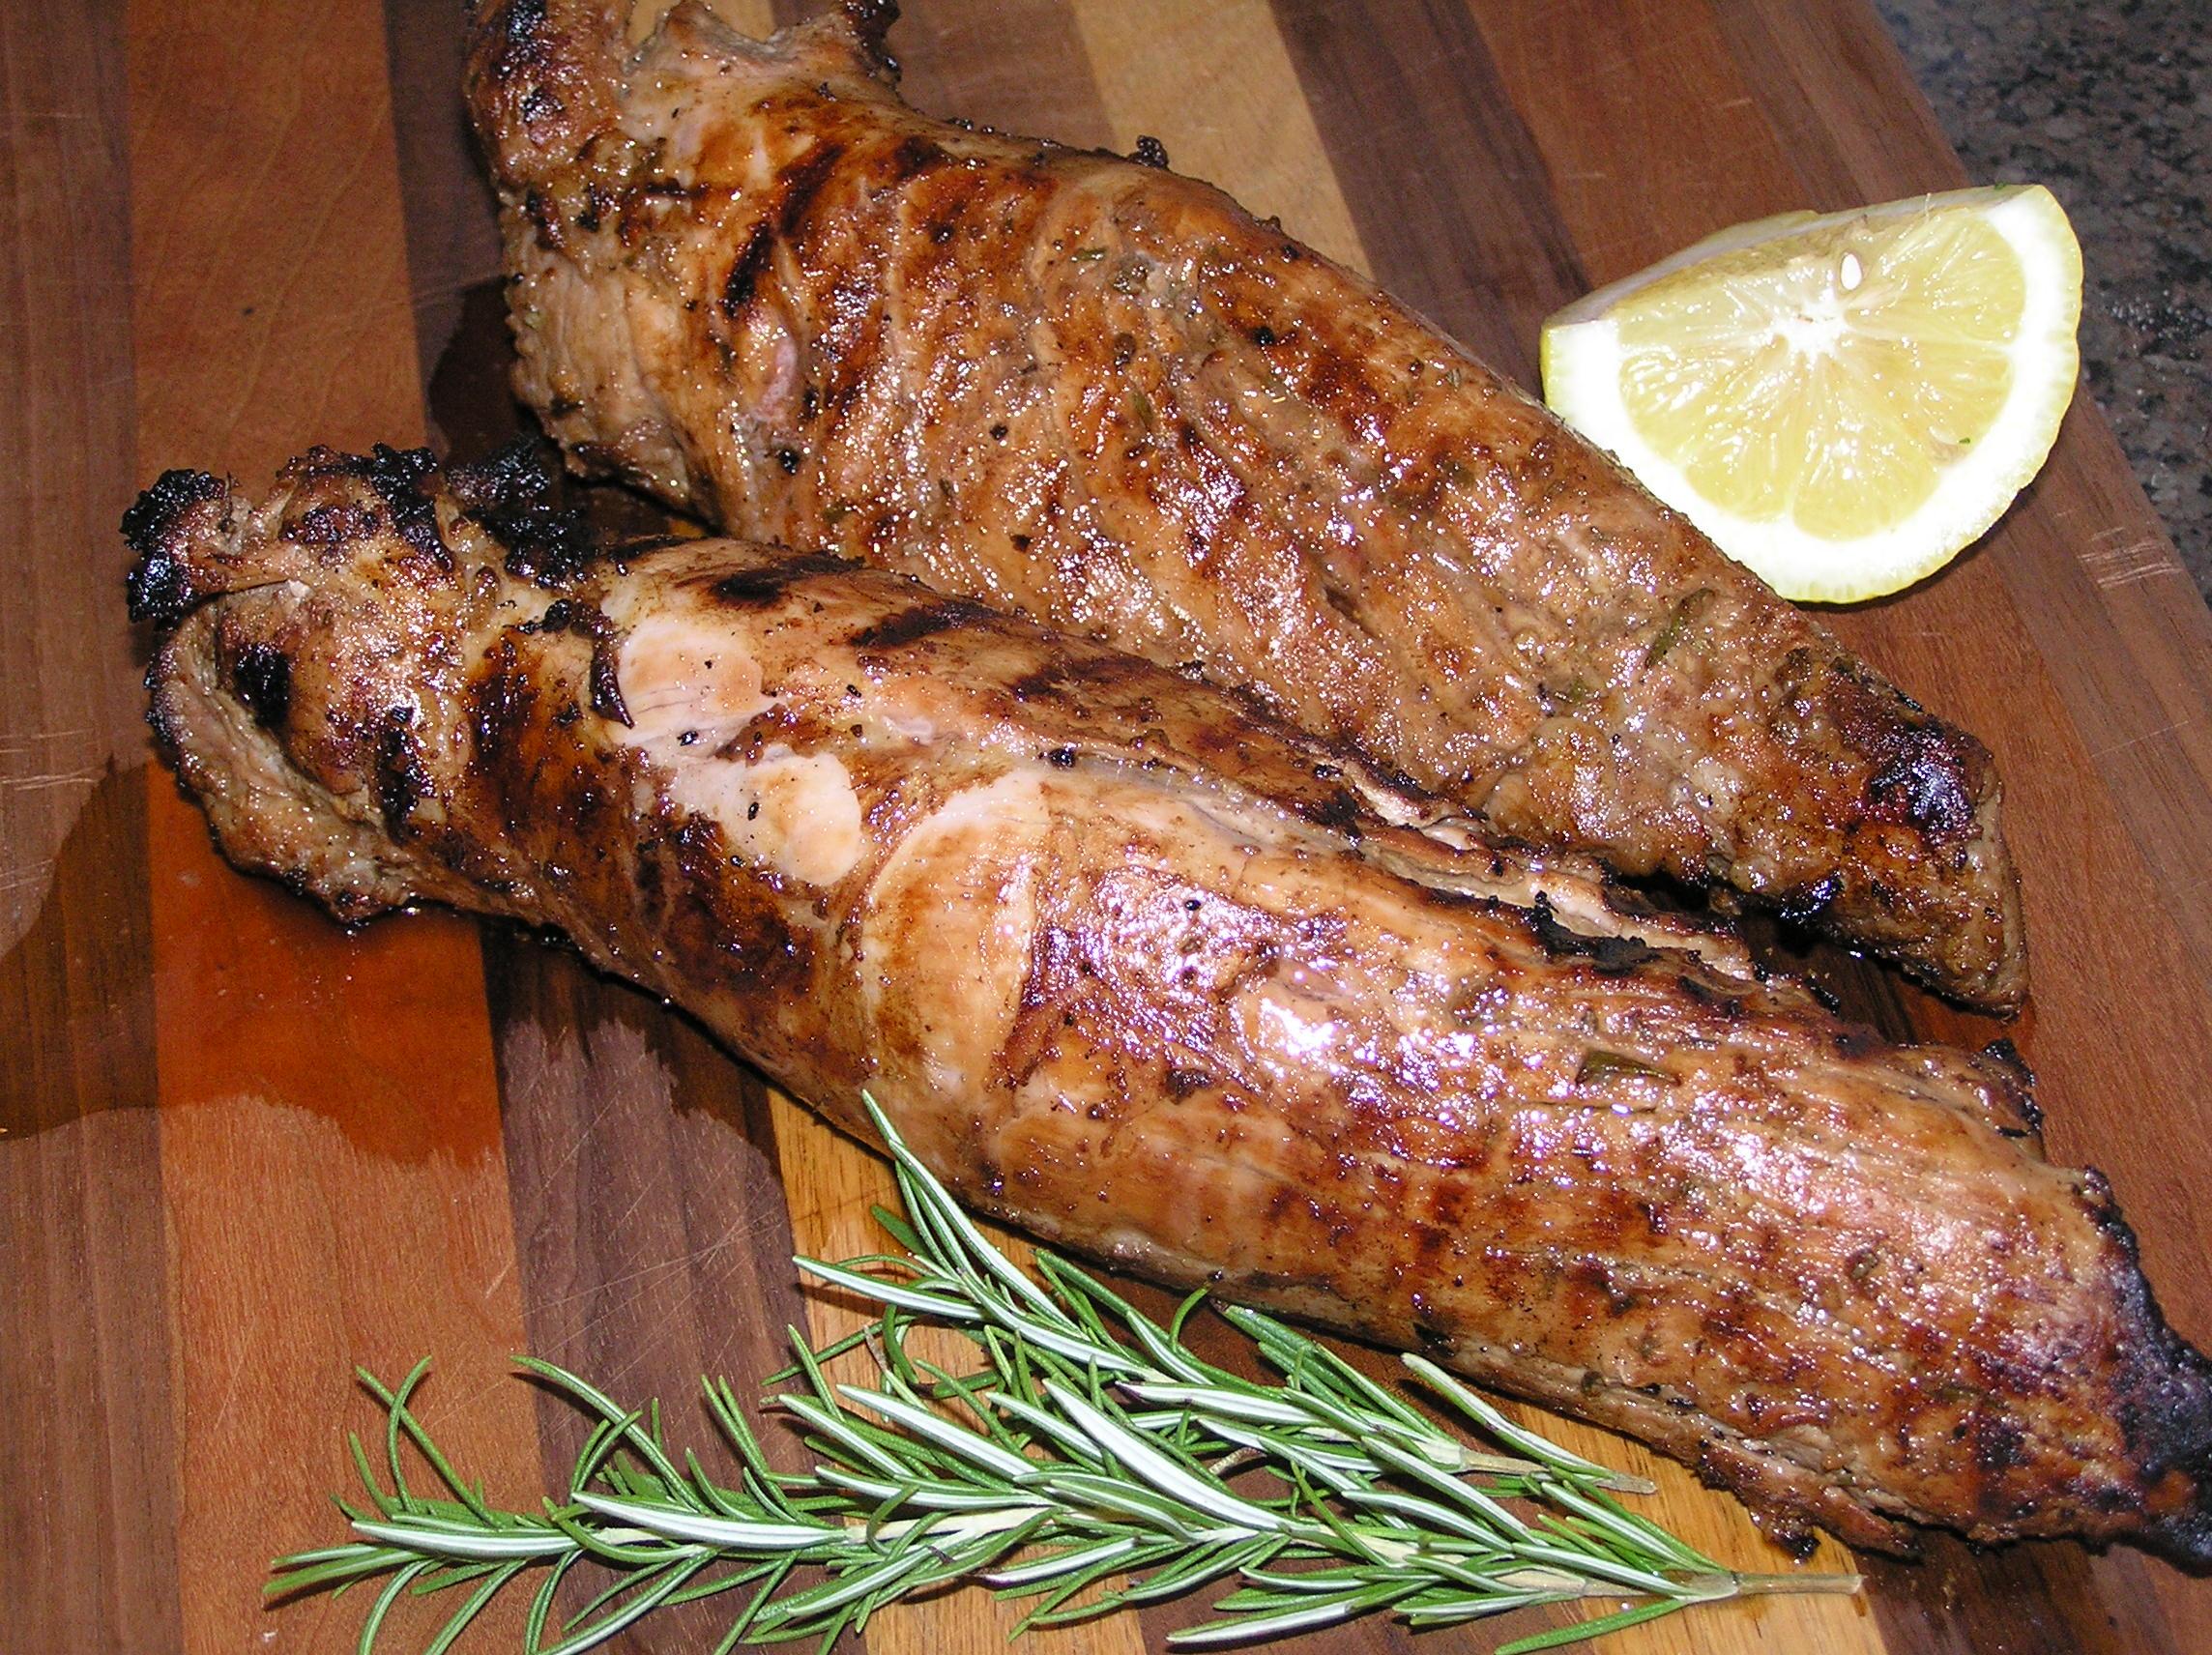 Rosemary Balsamic Garlic Marinated Grilled Pork Tenderloin ...